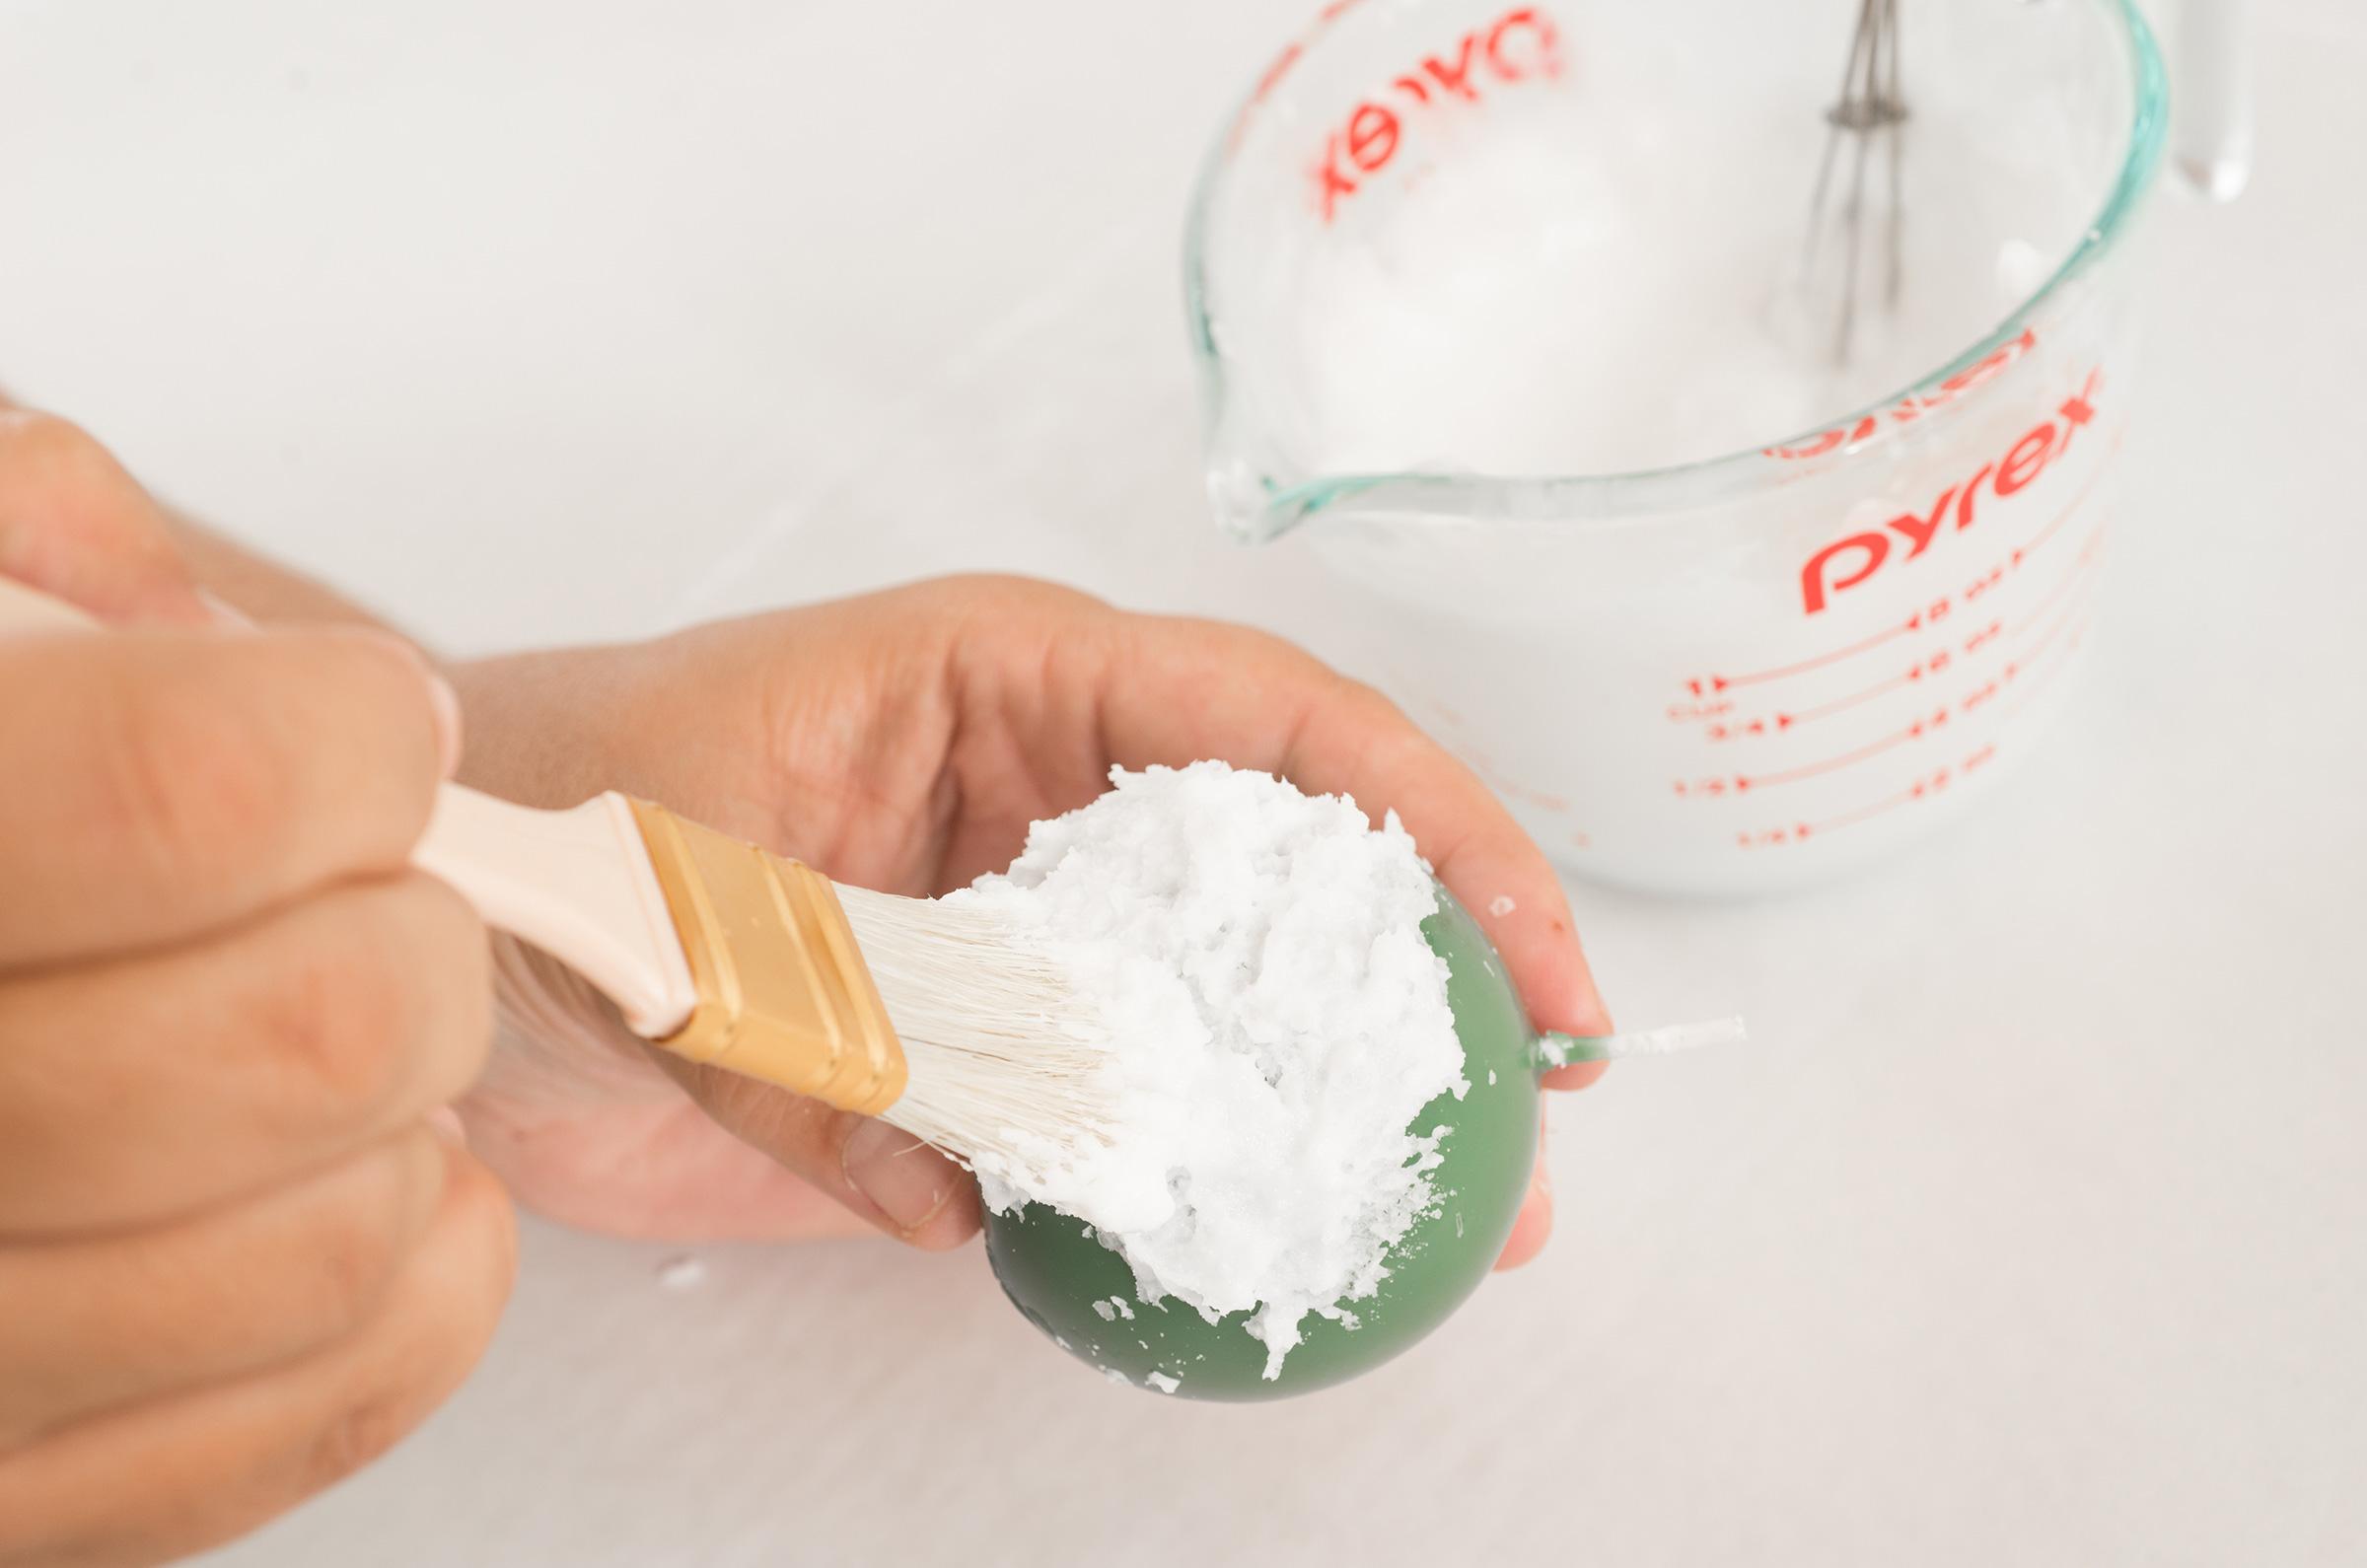 applying whipped wax